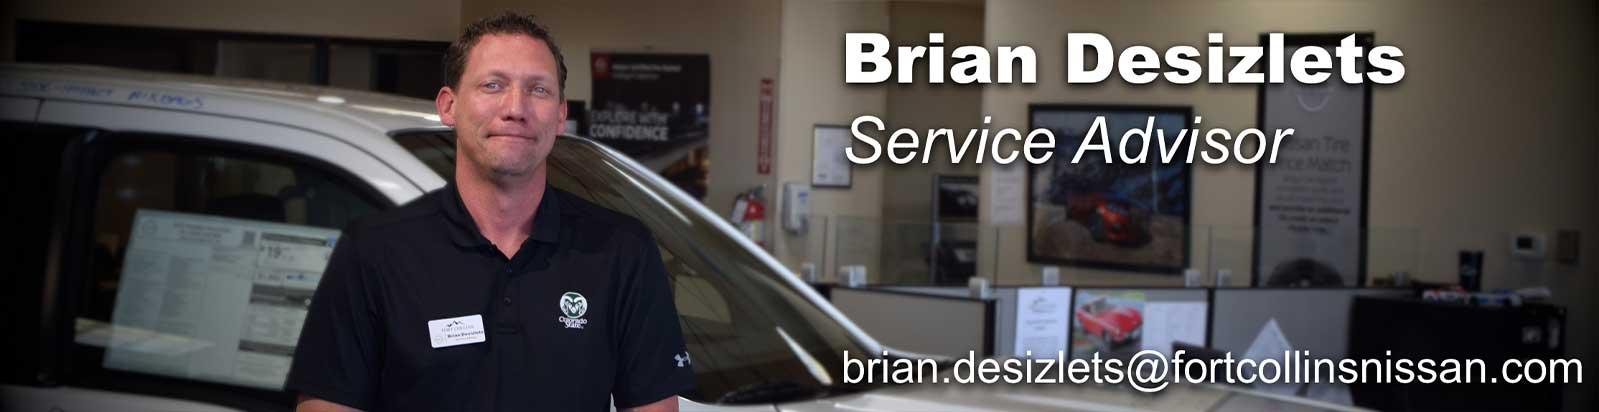 Brian Desizlets